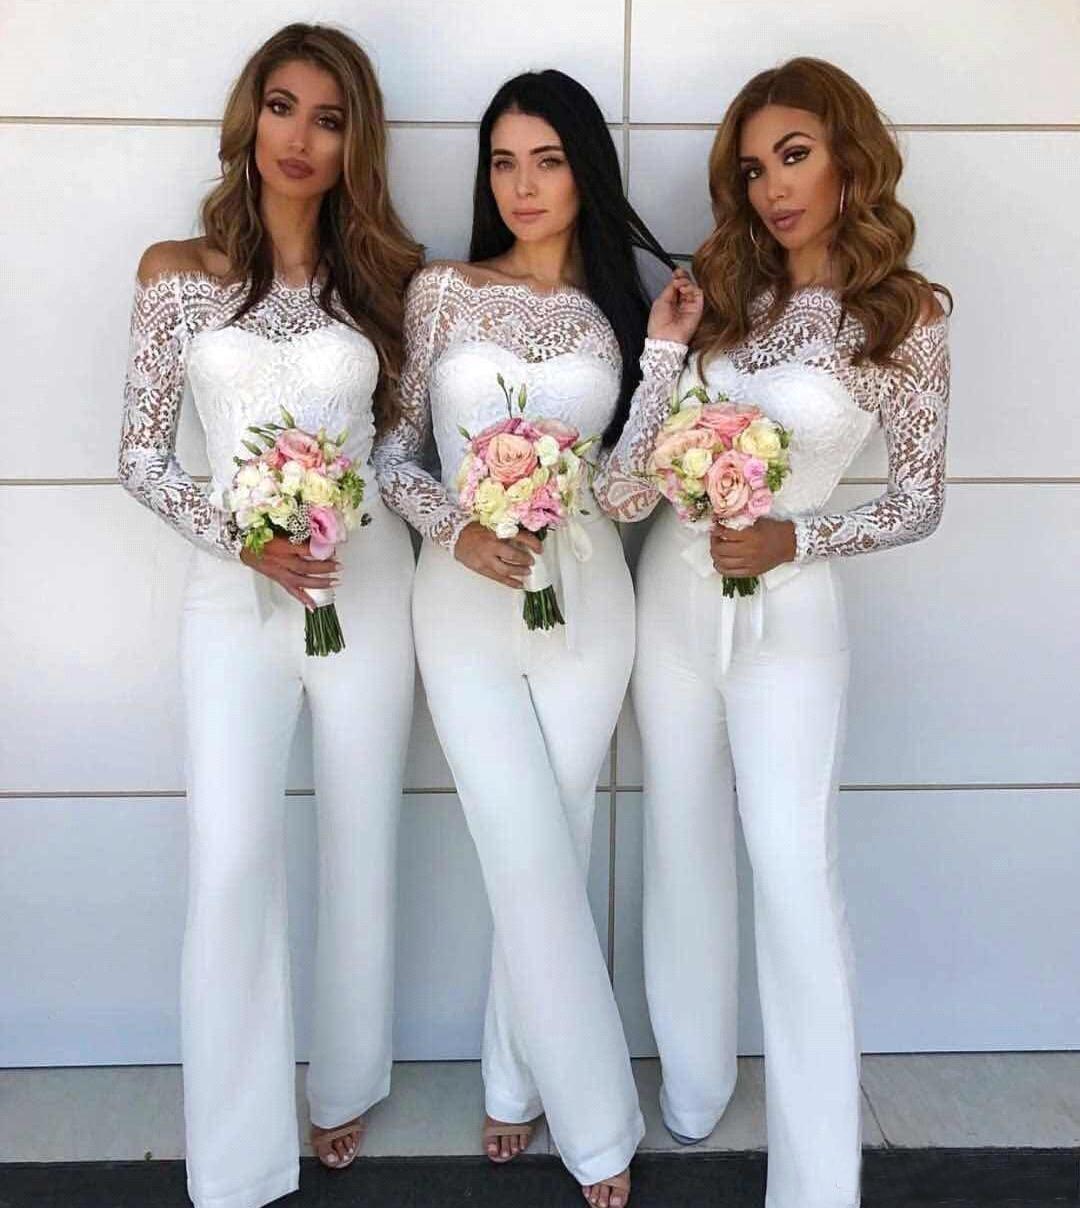 Off Shoulder Lace Jumpsuit Bridesmaid Dresses For Wedding 2020 Sheath Backless Wedding Guest Pants Suit Gowns